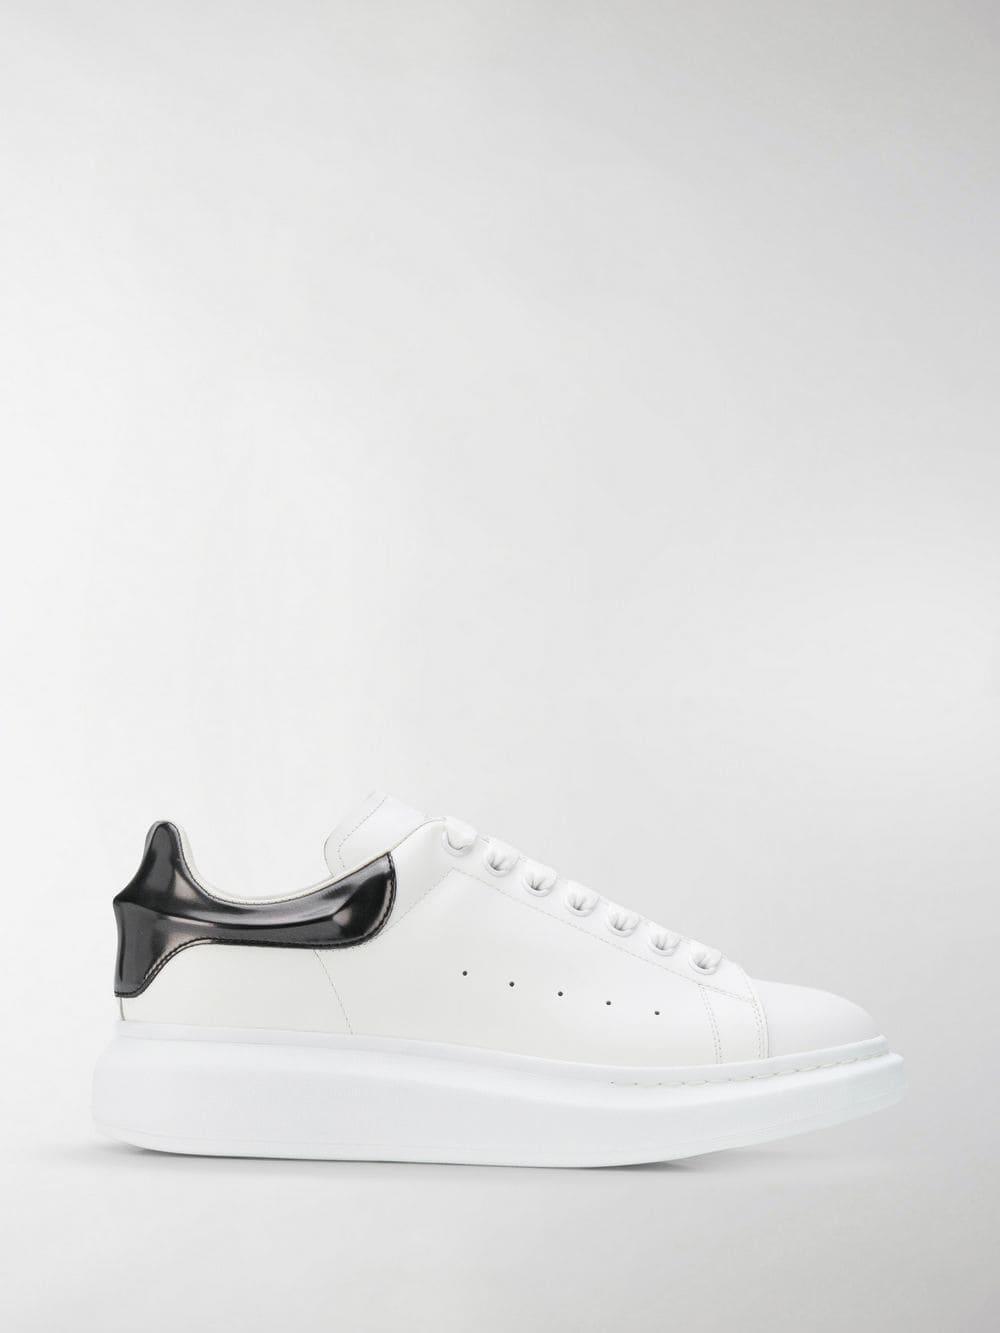 9f79558046b41 Lyst - Alexander McQueen Oversized Sole Sneakers in White for Men